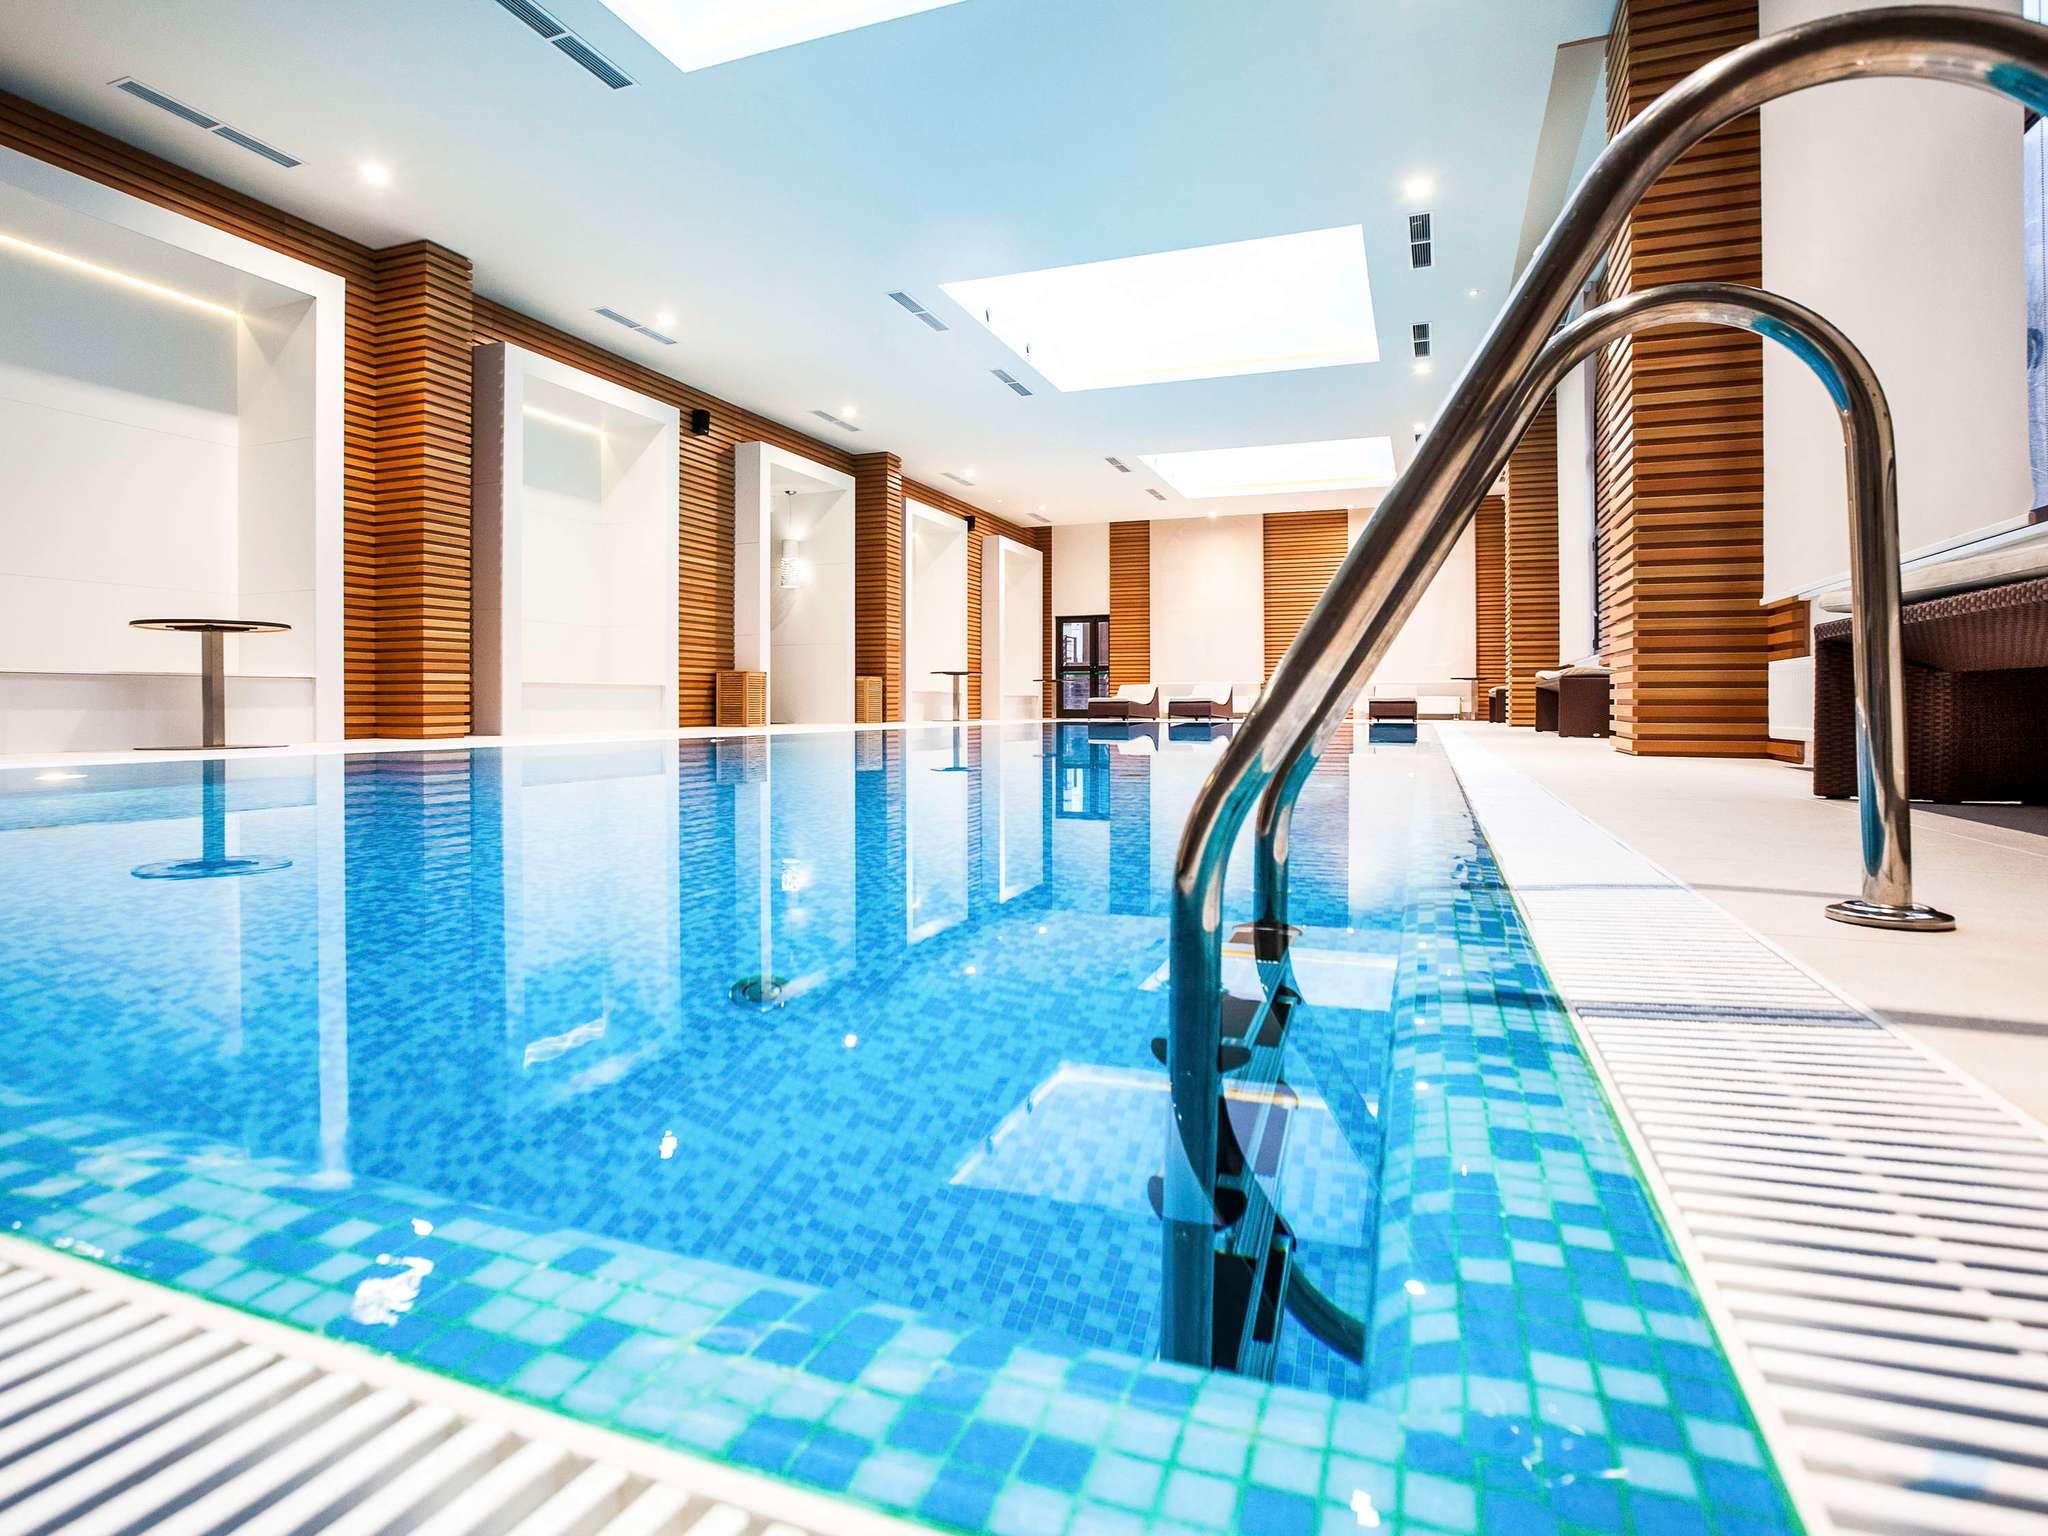 Hotel – Hotel Mercure Rosa Khutor